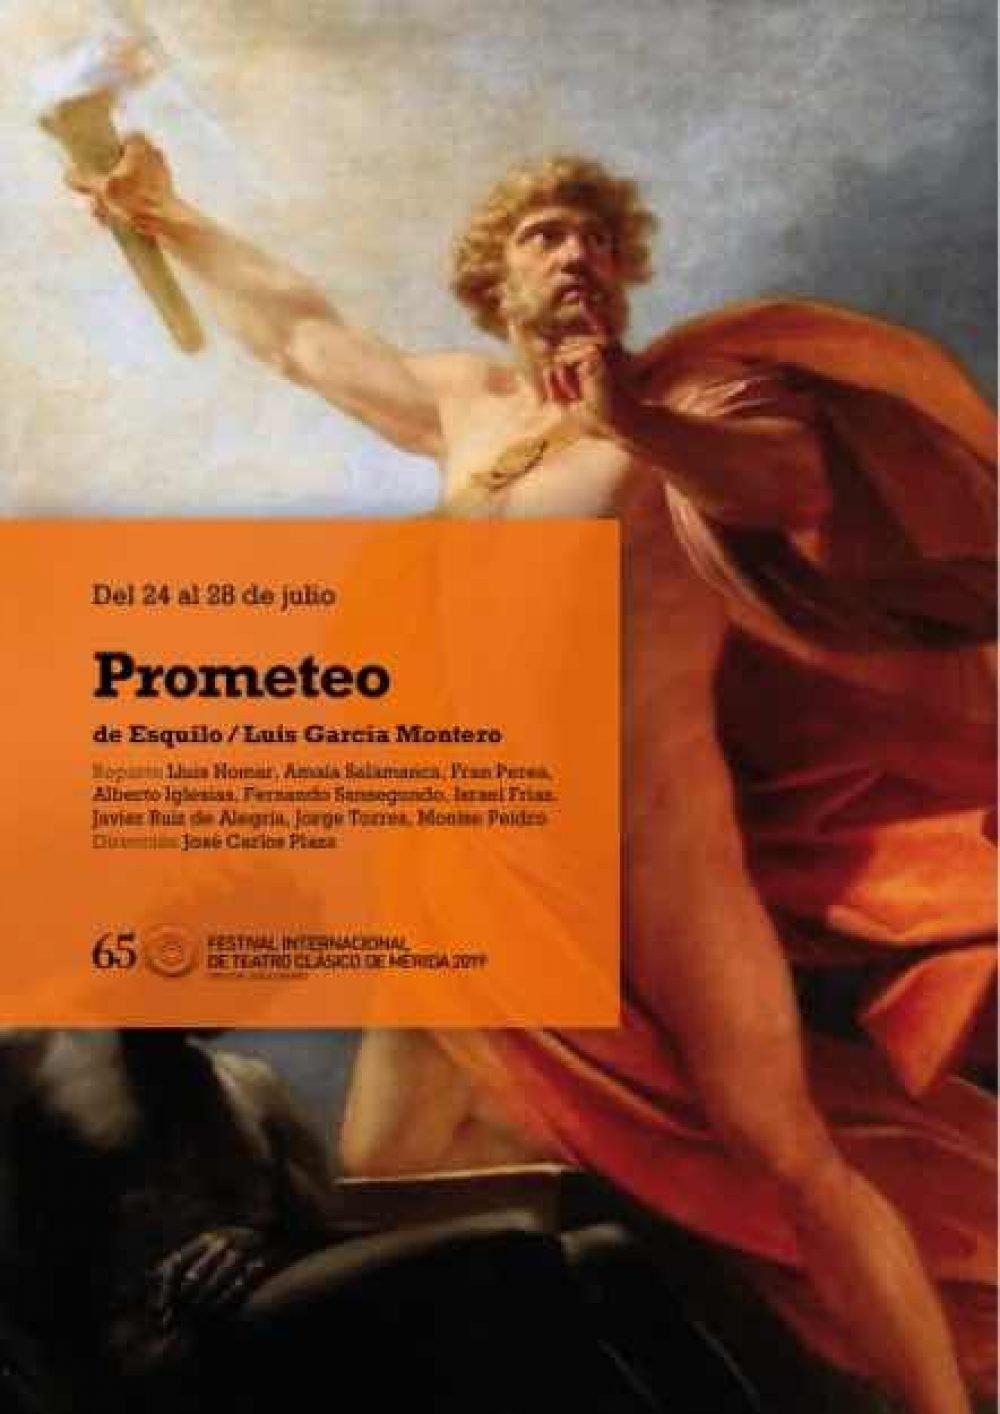 Prometeo. Festival Internacional de Teatro Clásico de Mérida